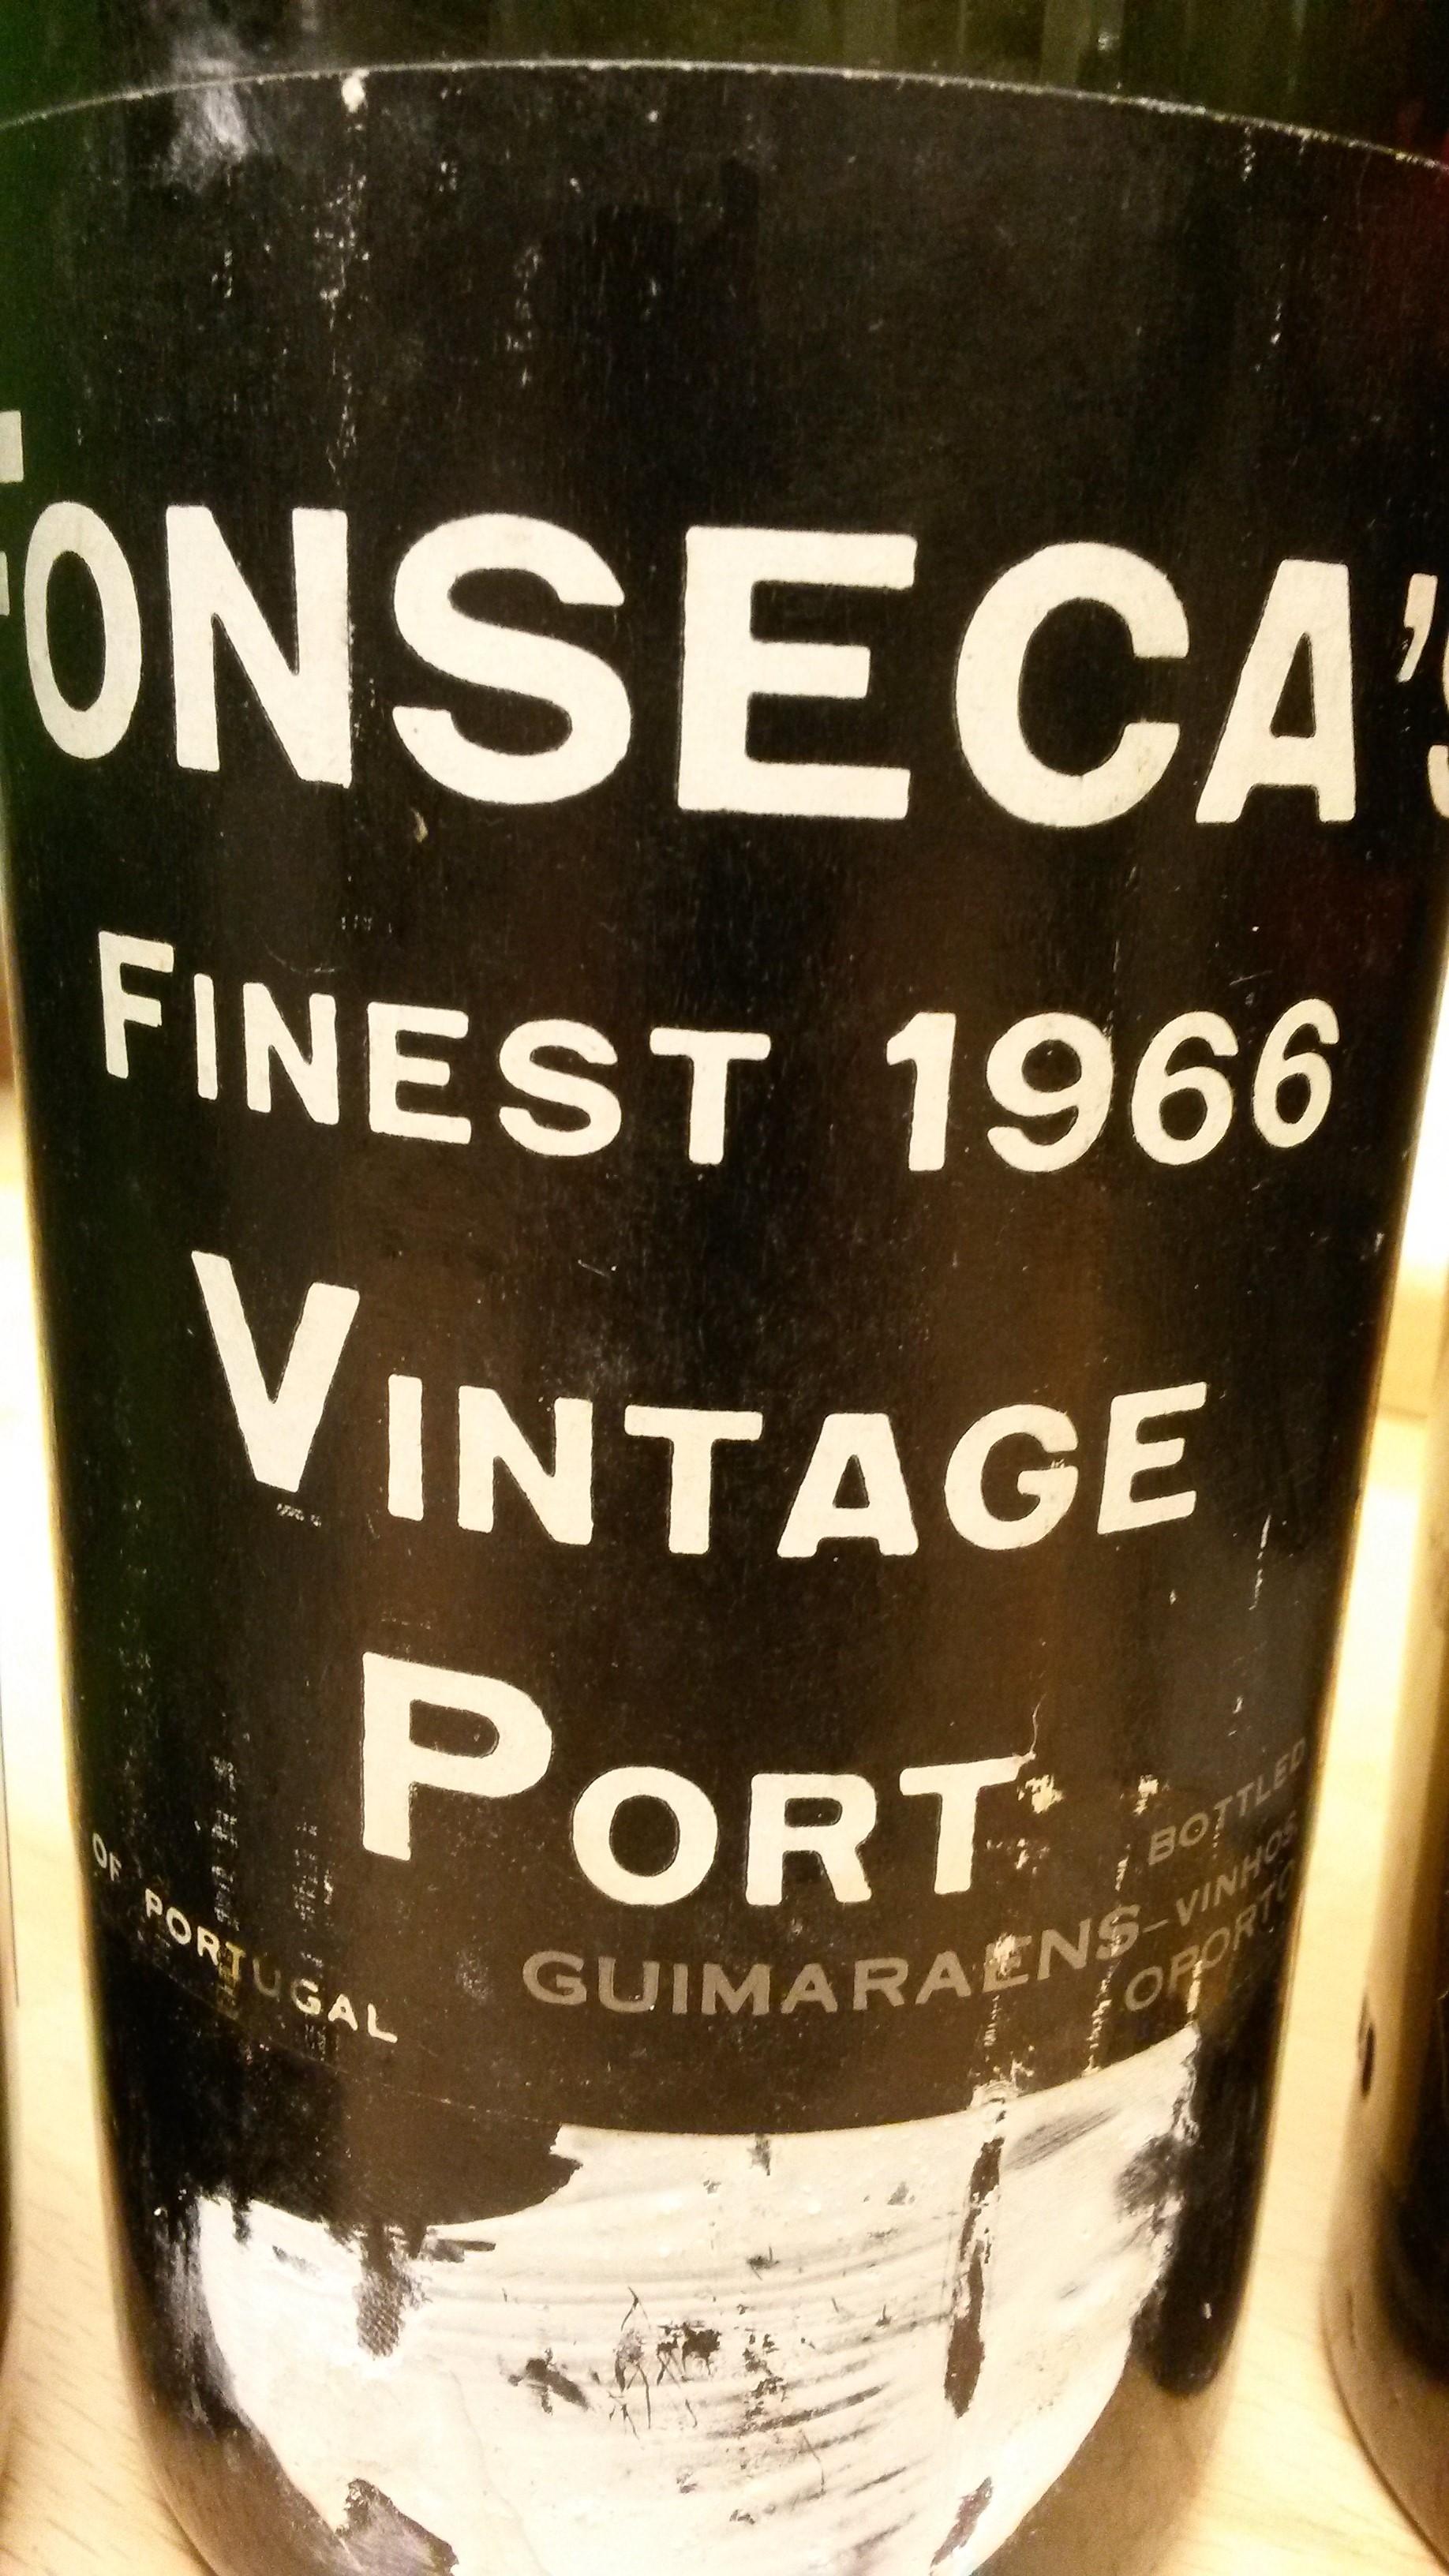 Fonseca vintage 1966